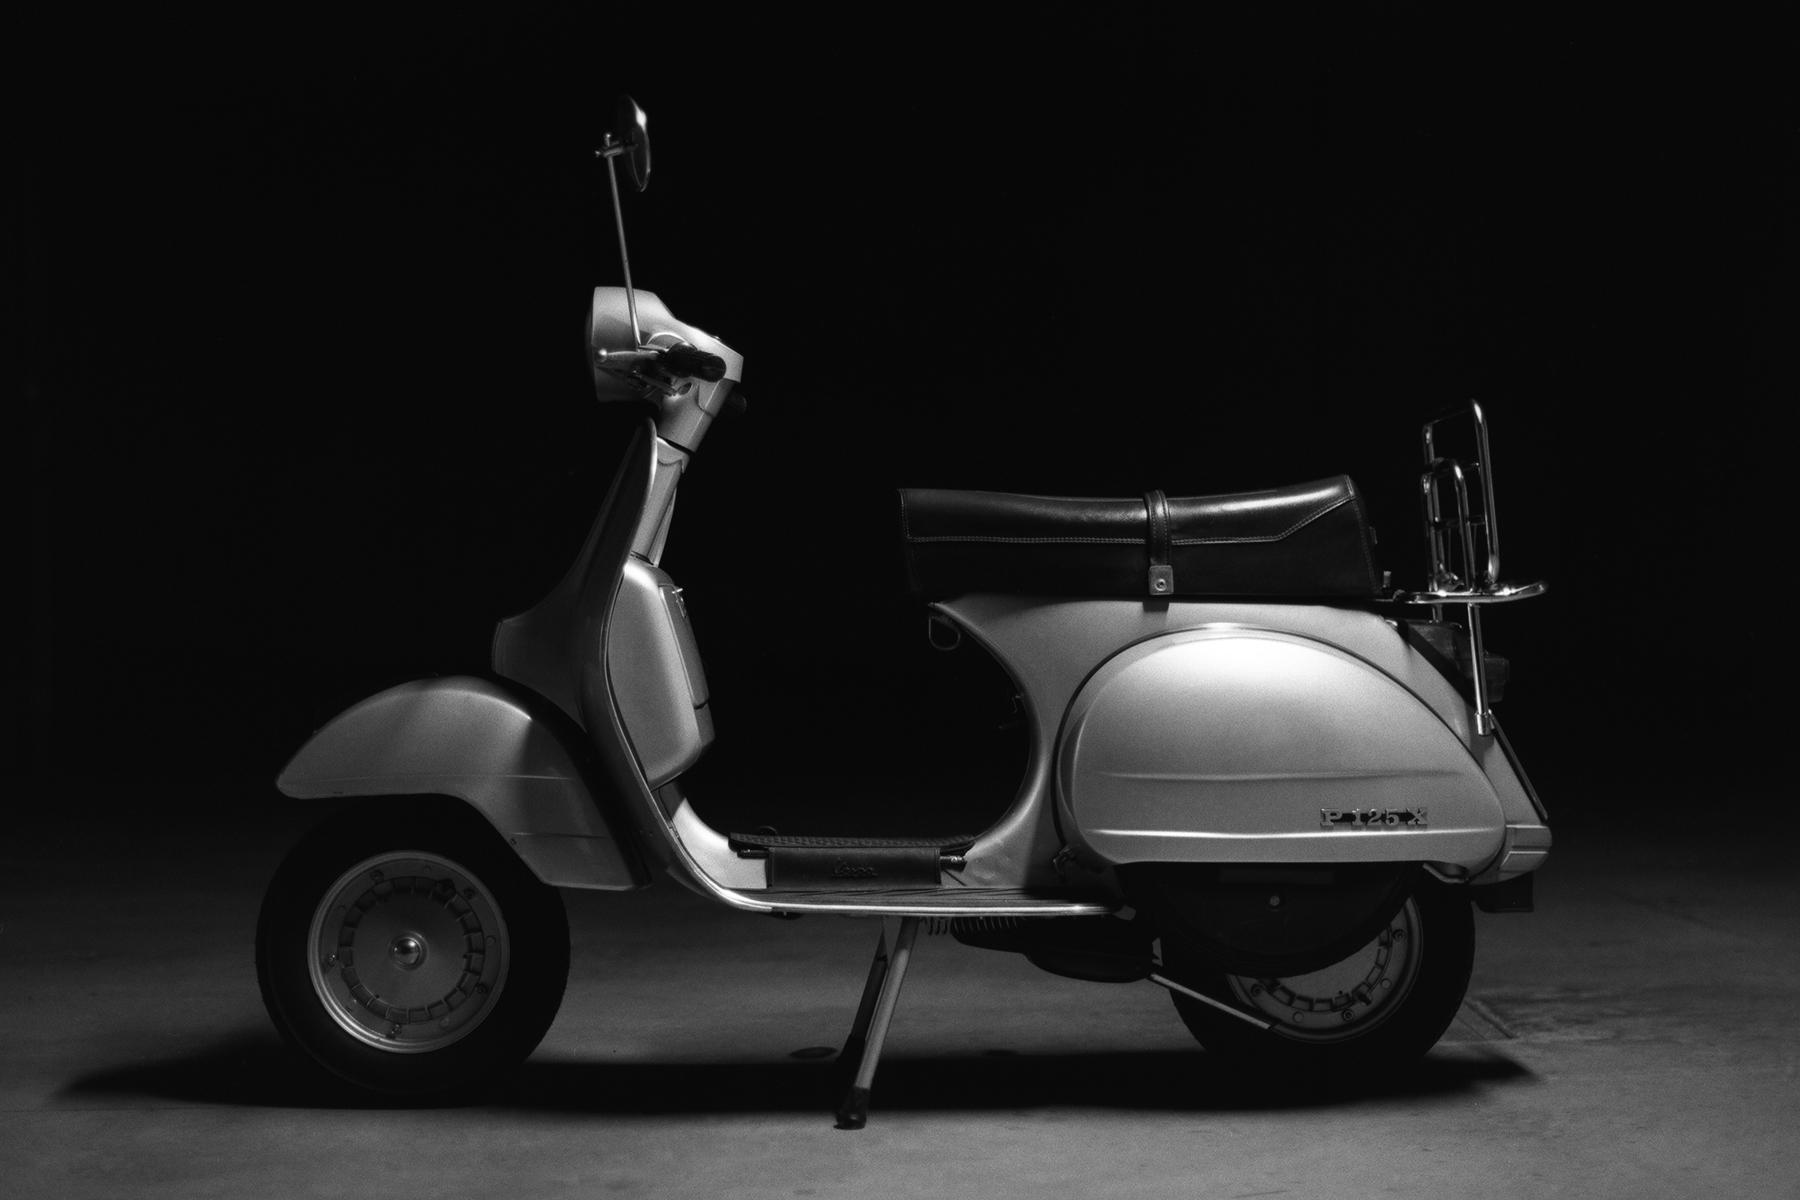 Classy | Mamiya M645 1000s | Sekor C 80mm | Ilford FP4+ | Umberto Gnocchi